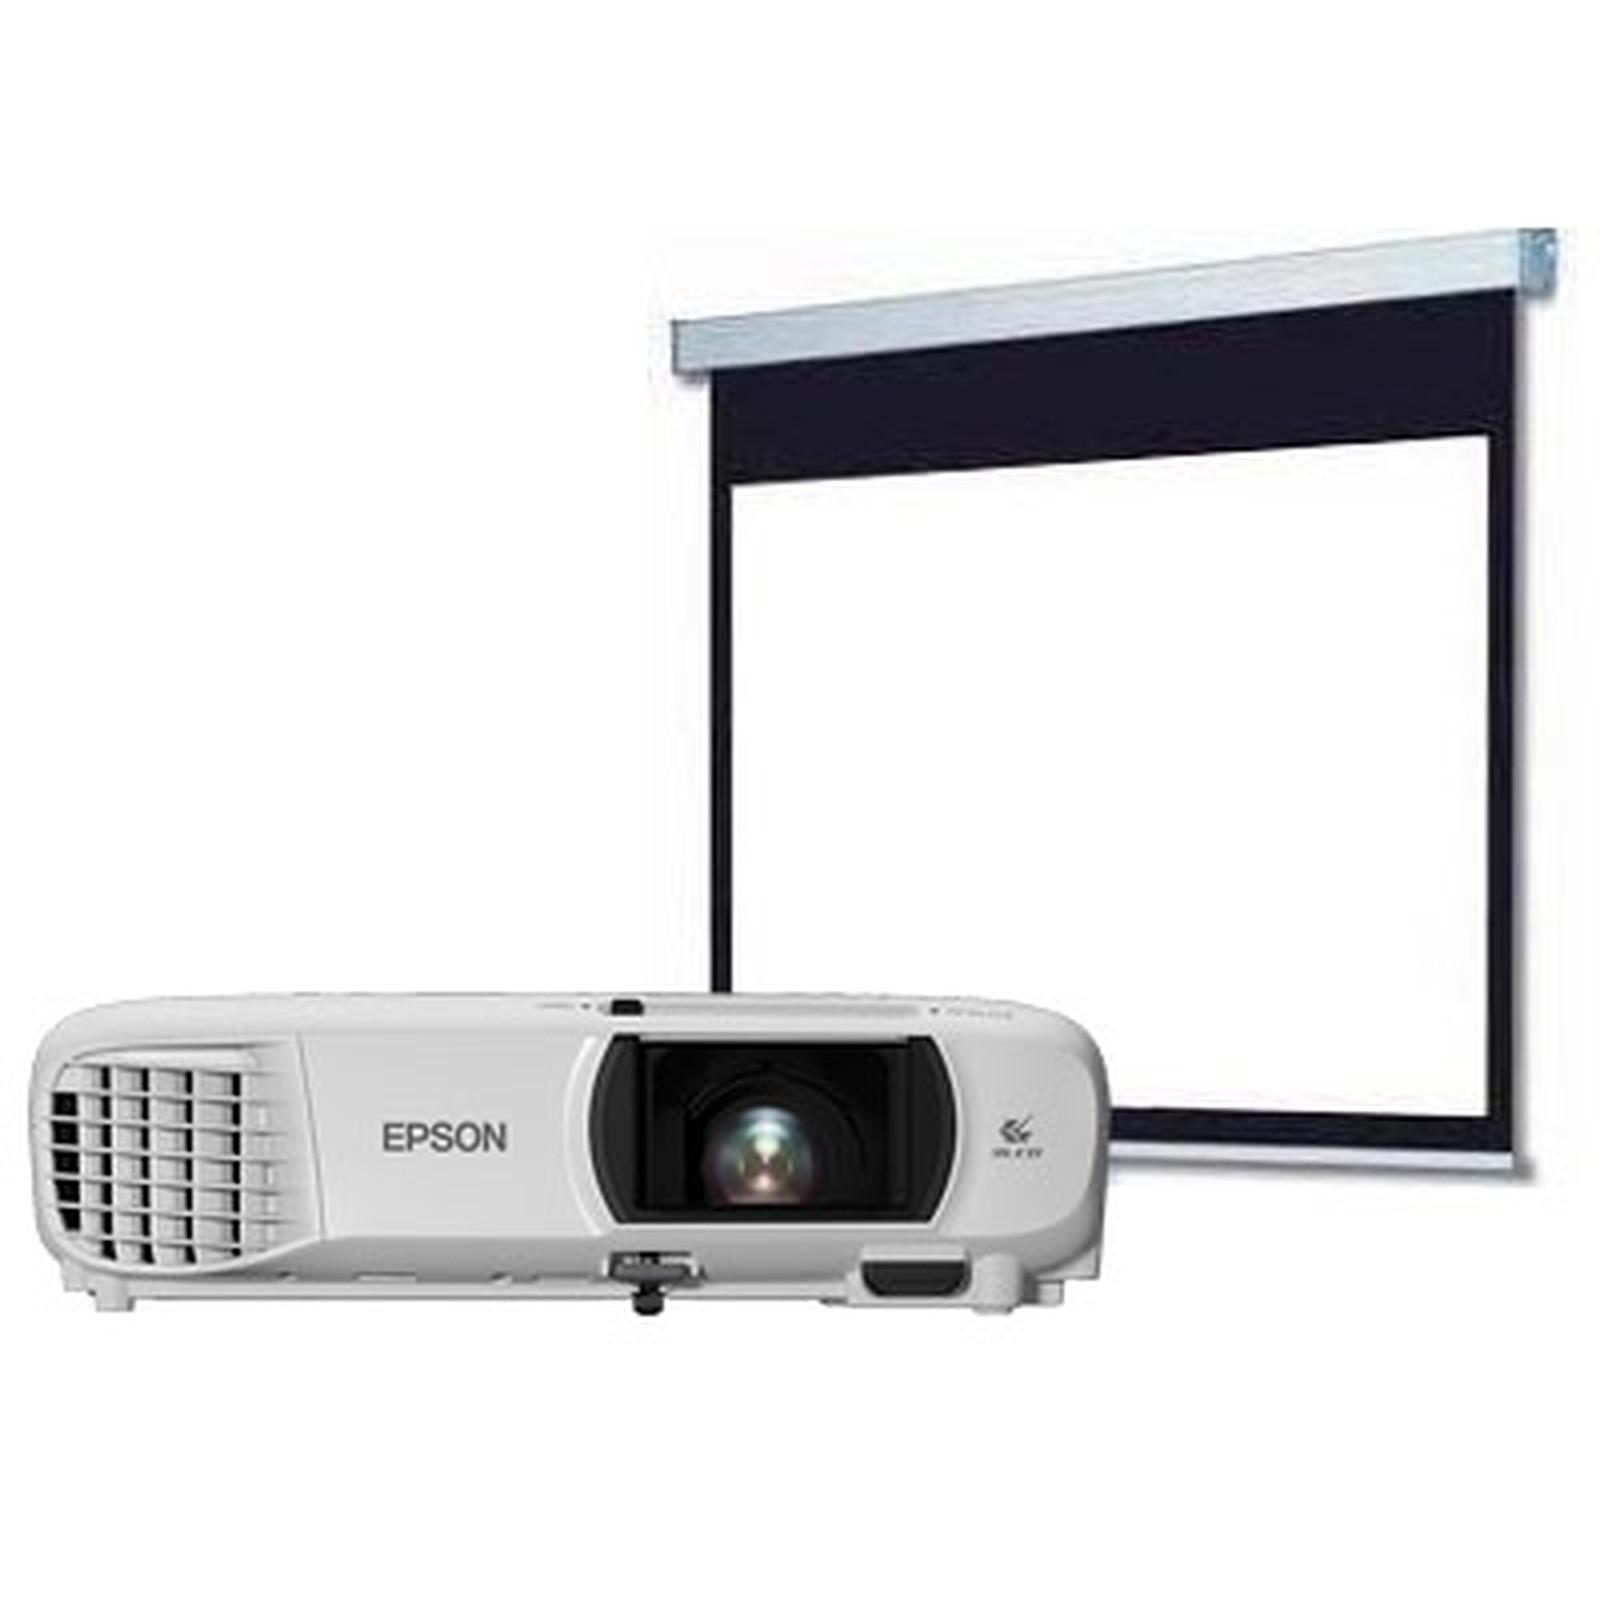 Epson EH-TW650 + LDLC Ecran Manuel - Format 16:9 - 200 x 113 cm